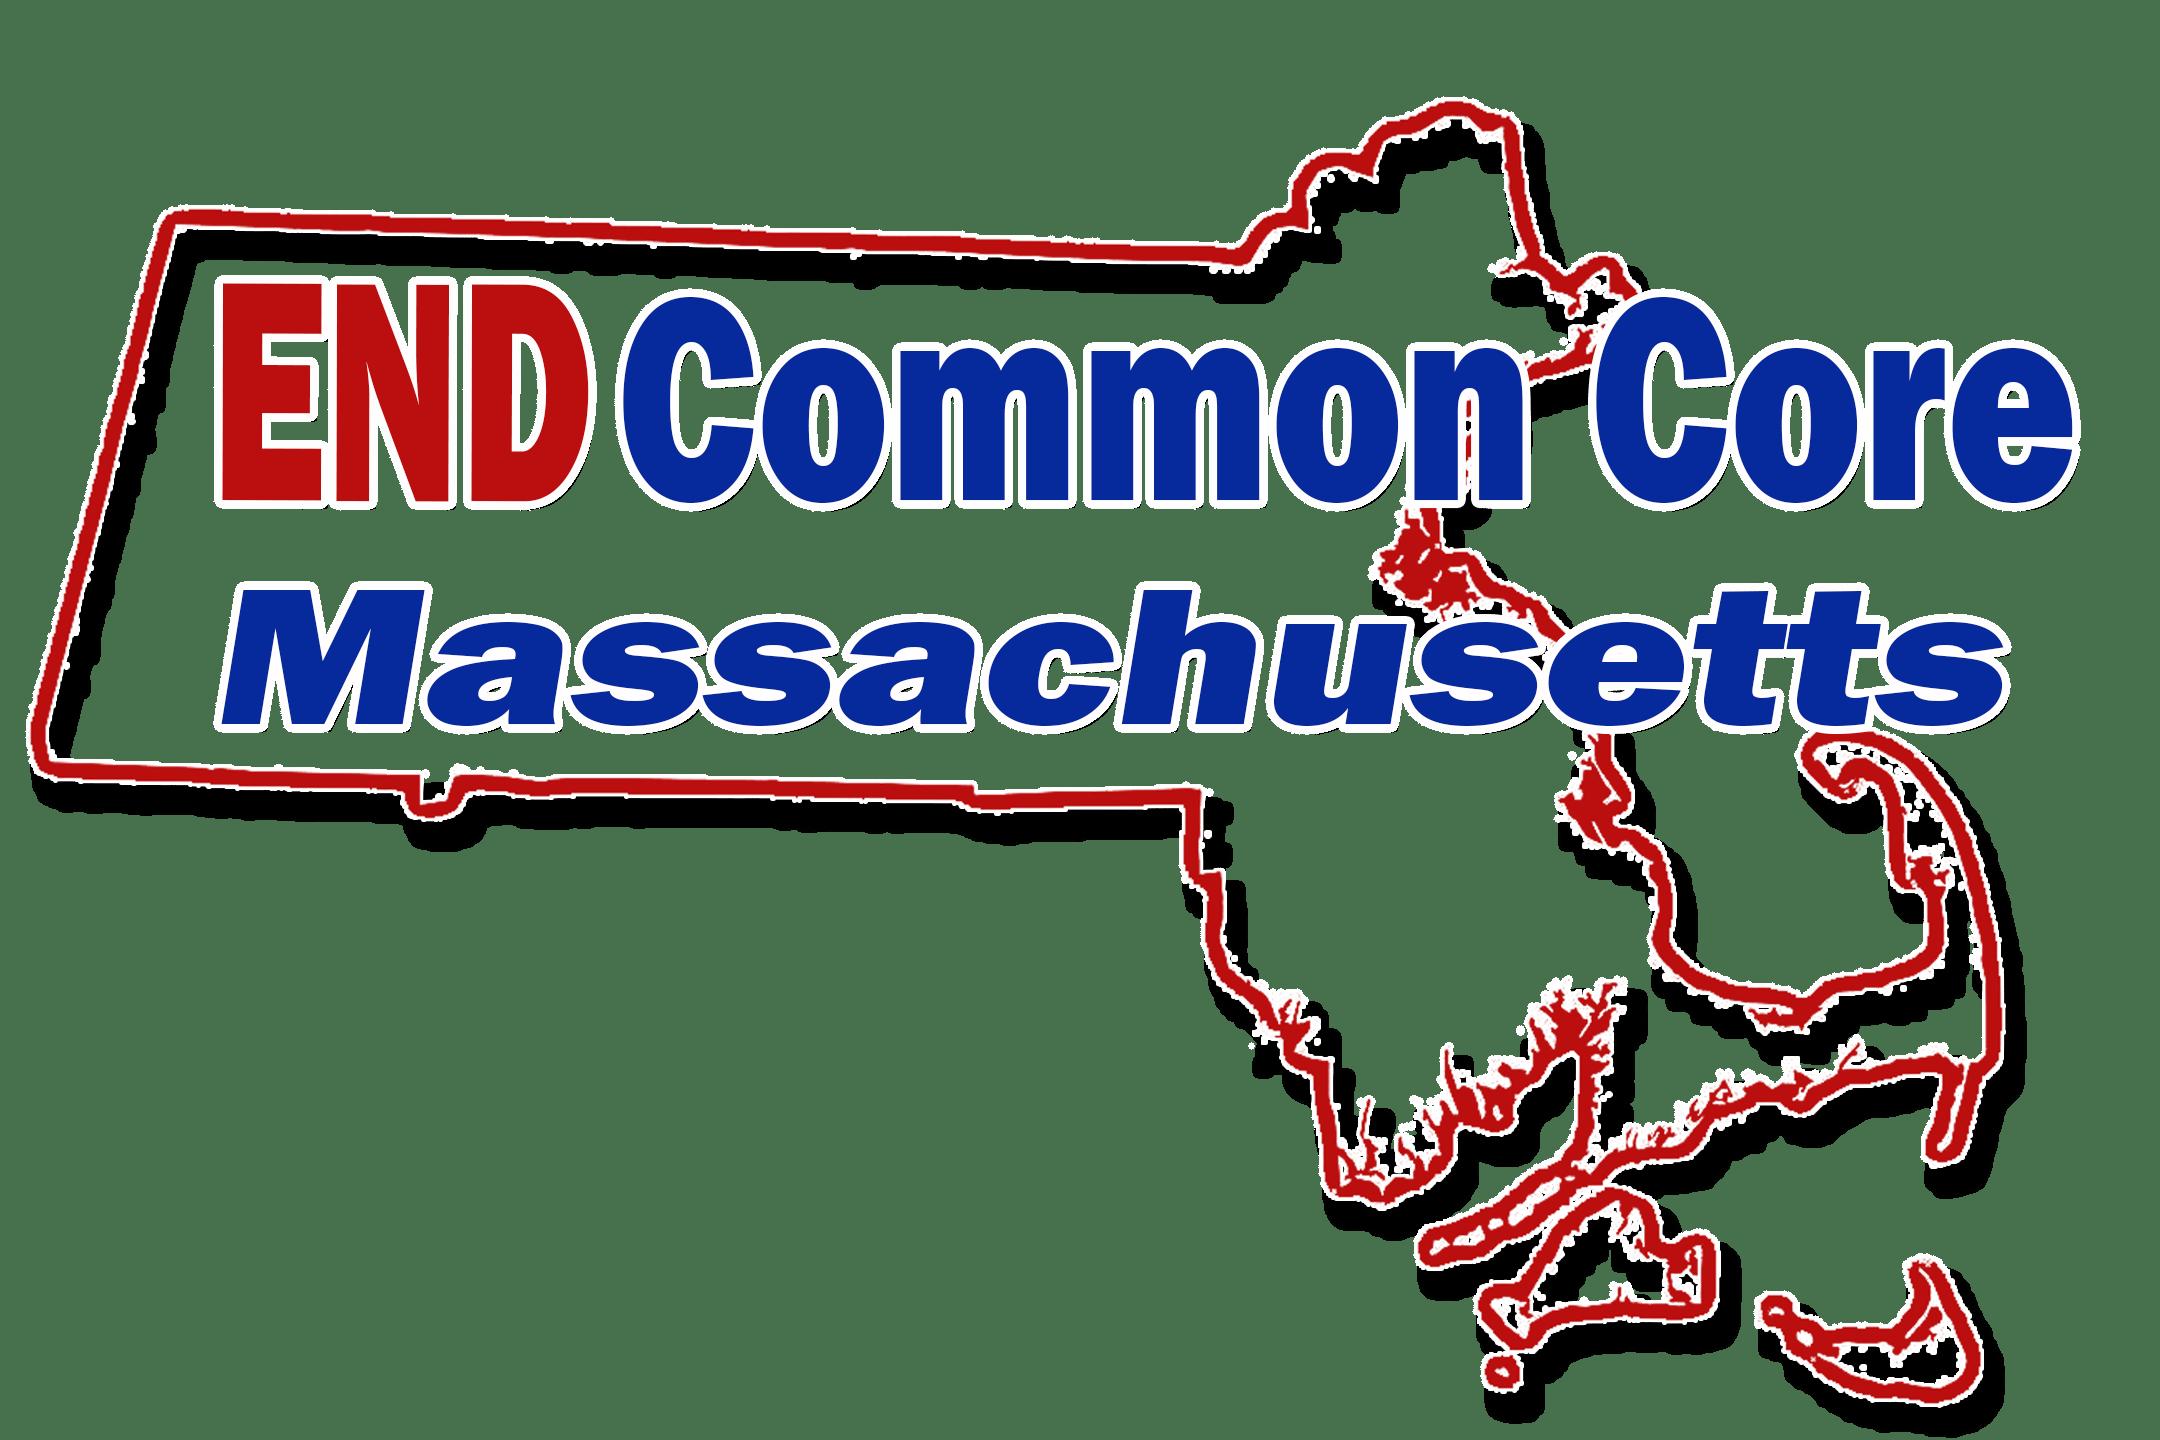 END Common Core Massachusetts